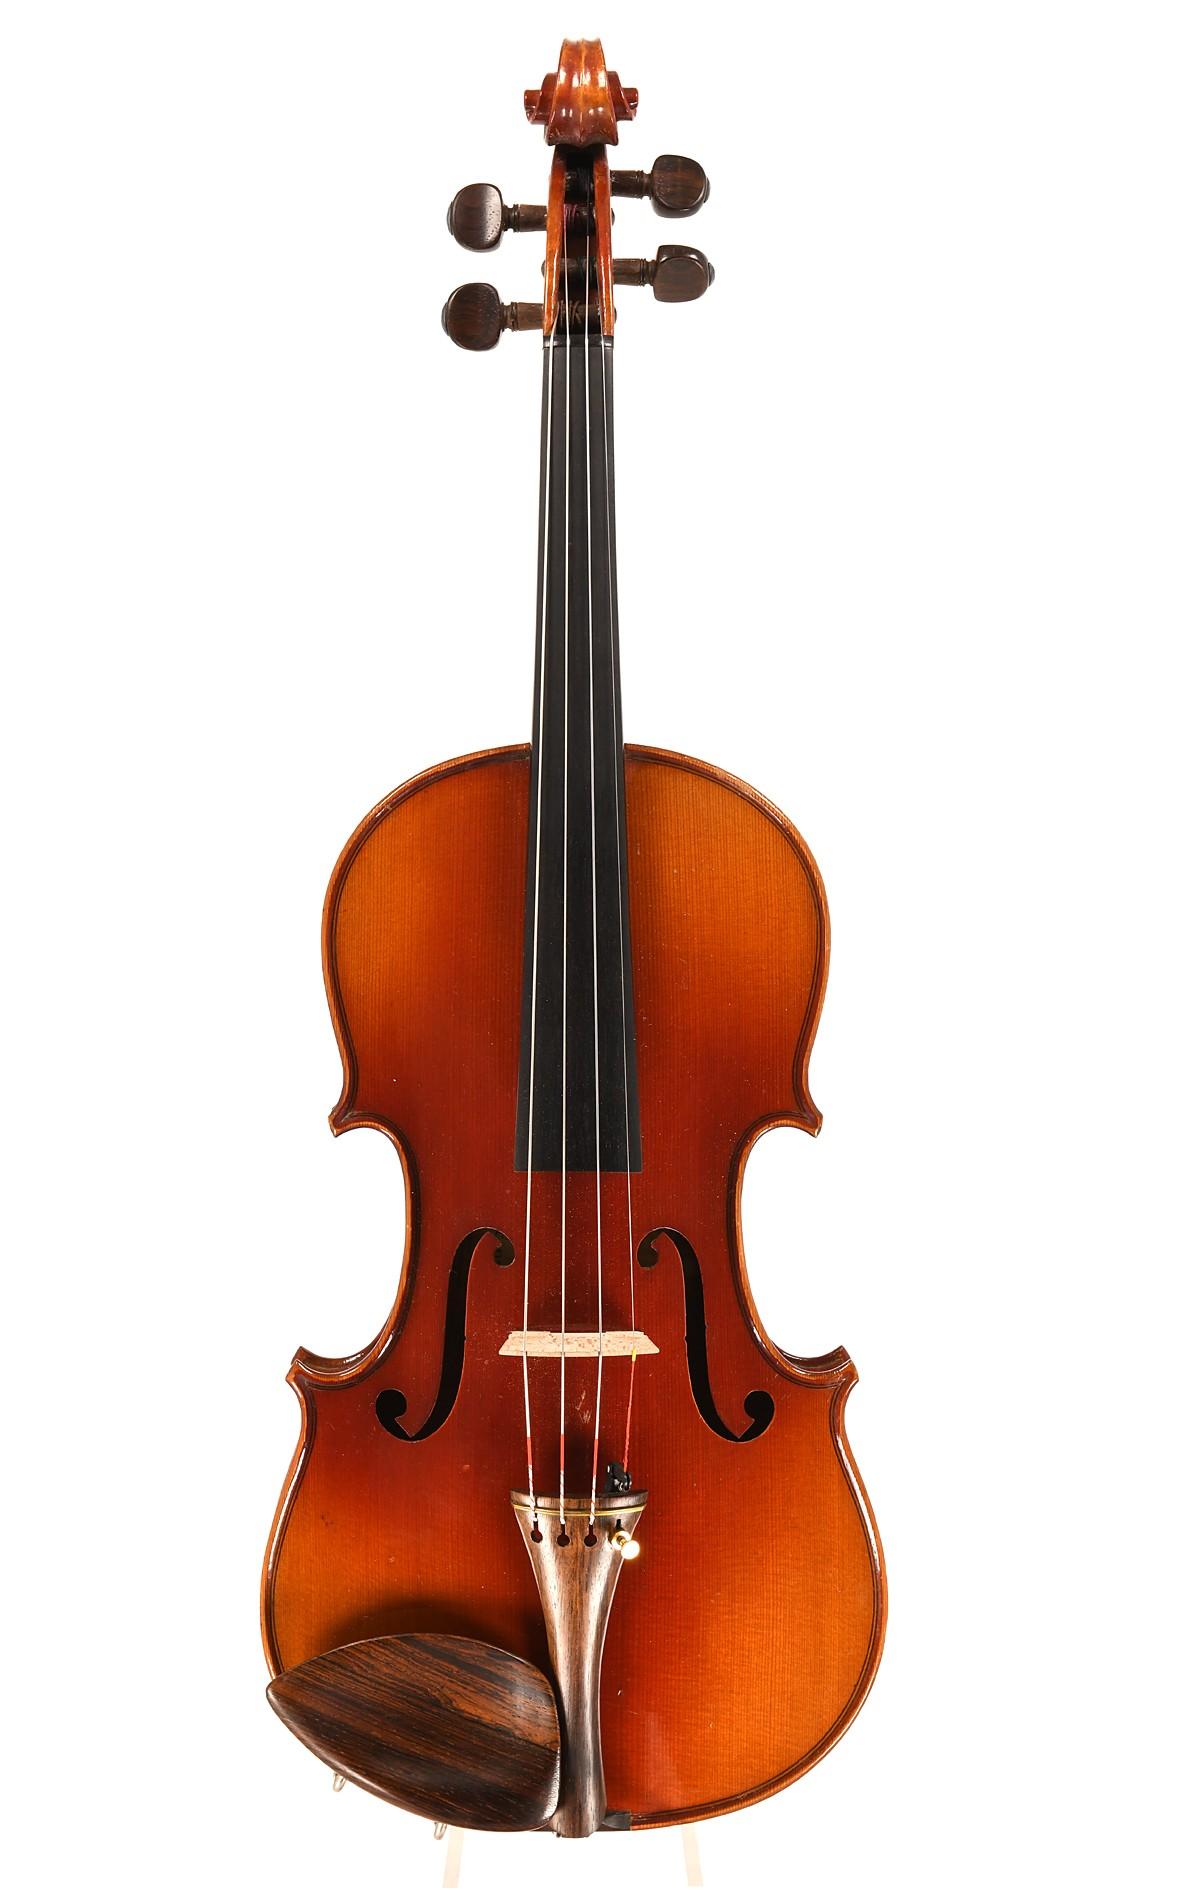 Violin by H. Emile Blondelet - Nr. C7, 1924